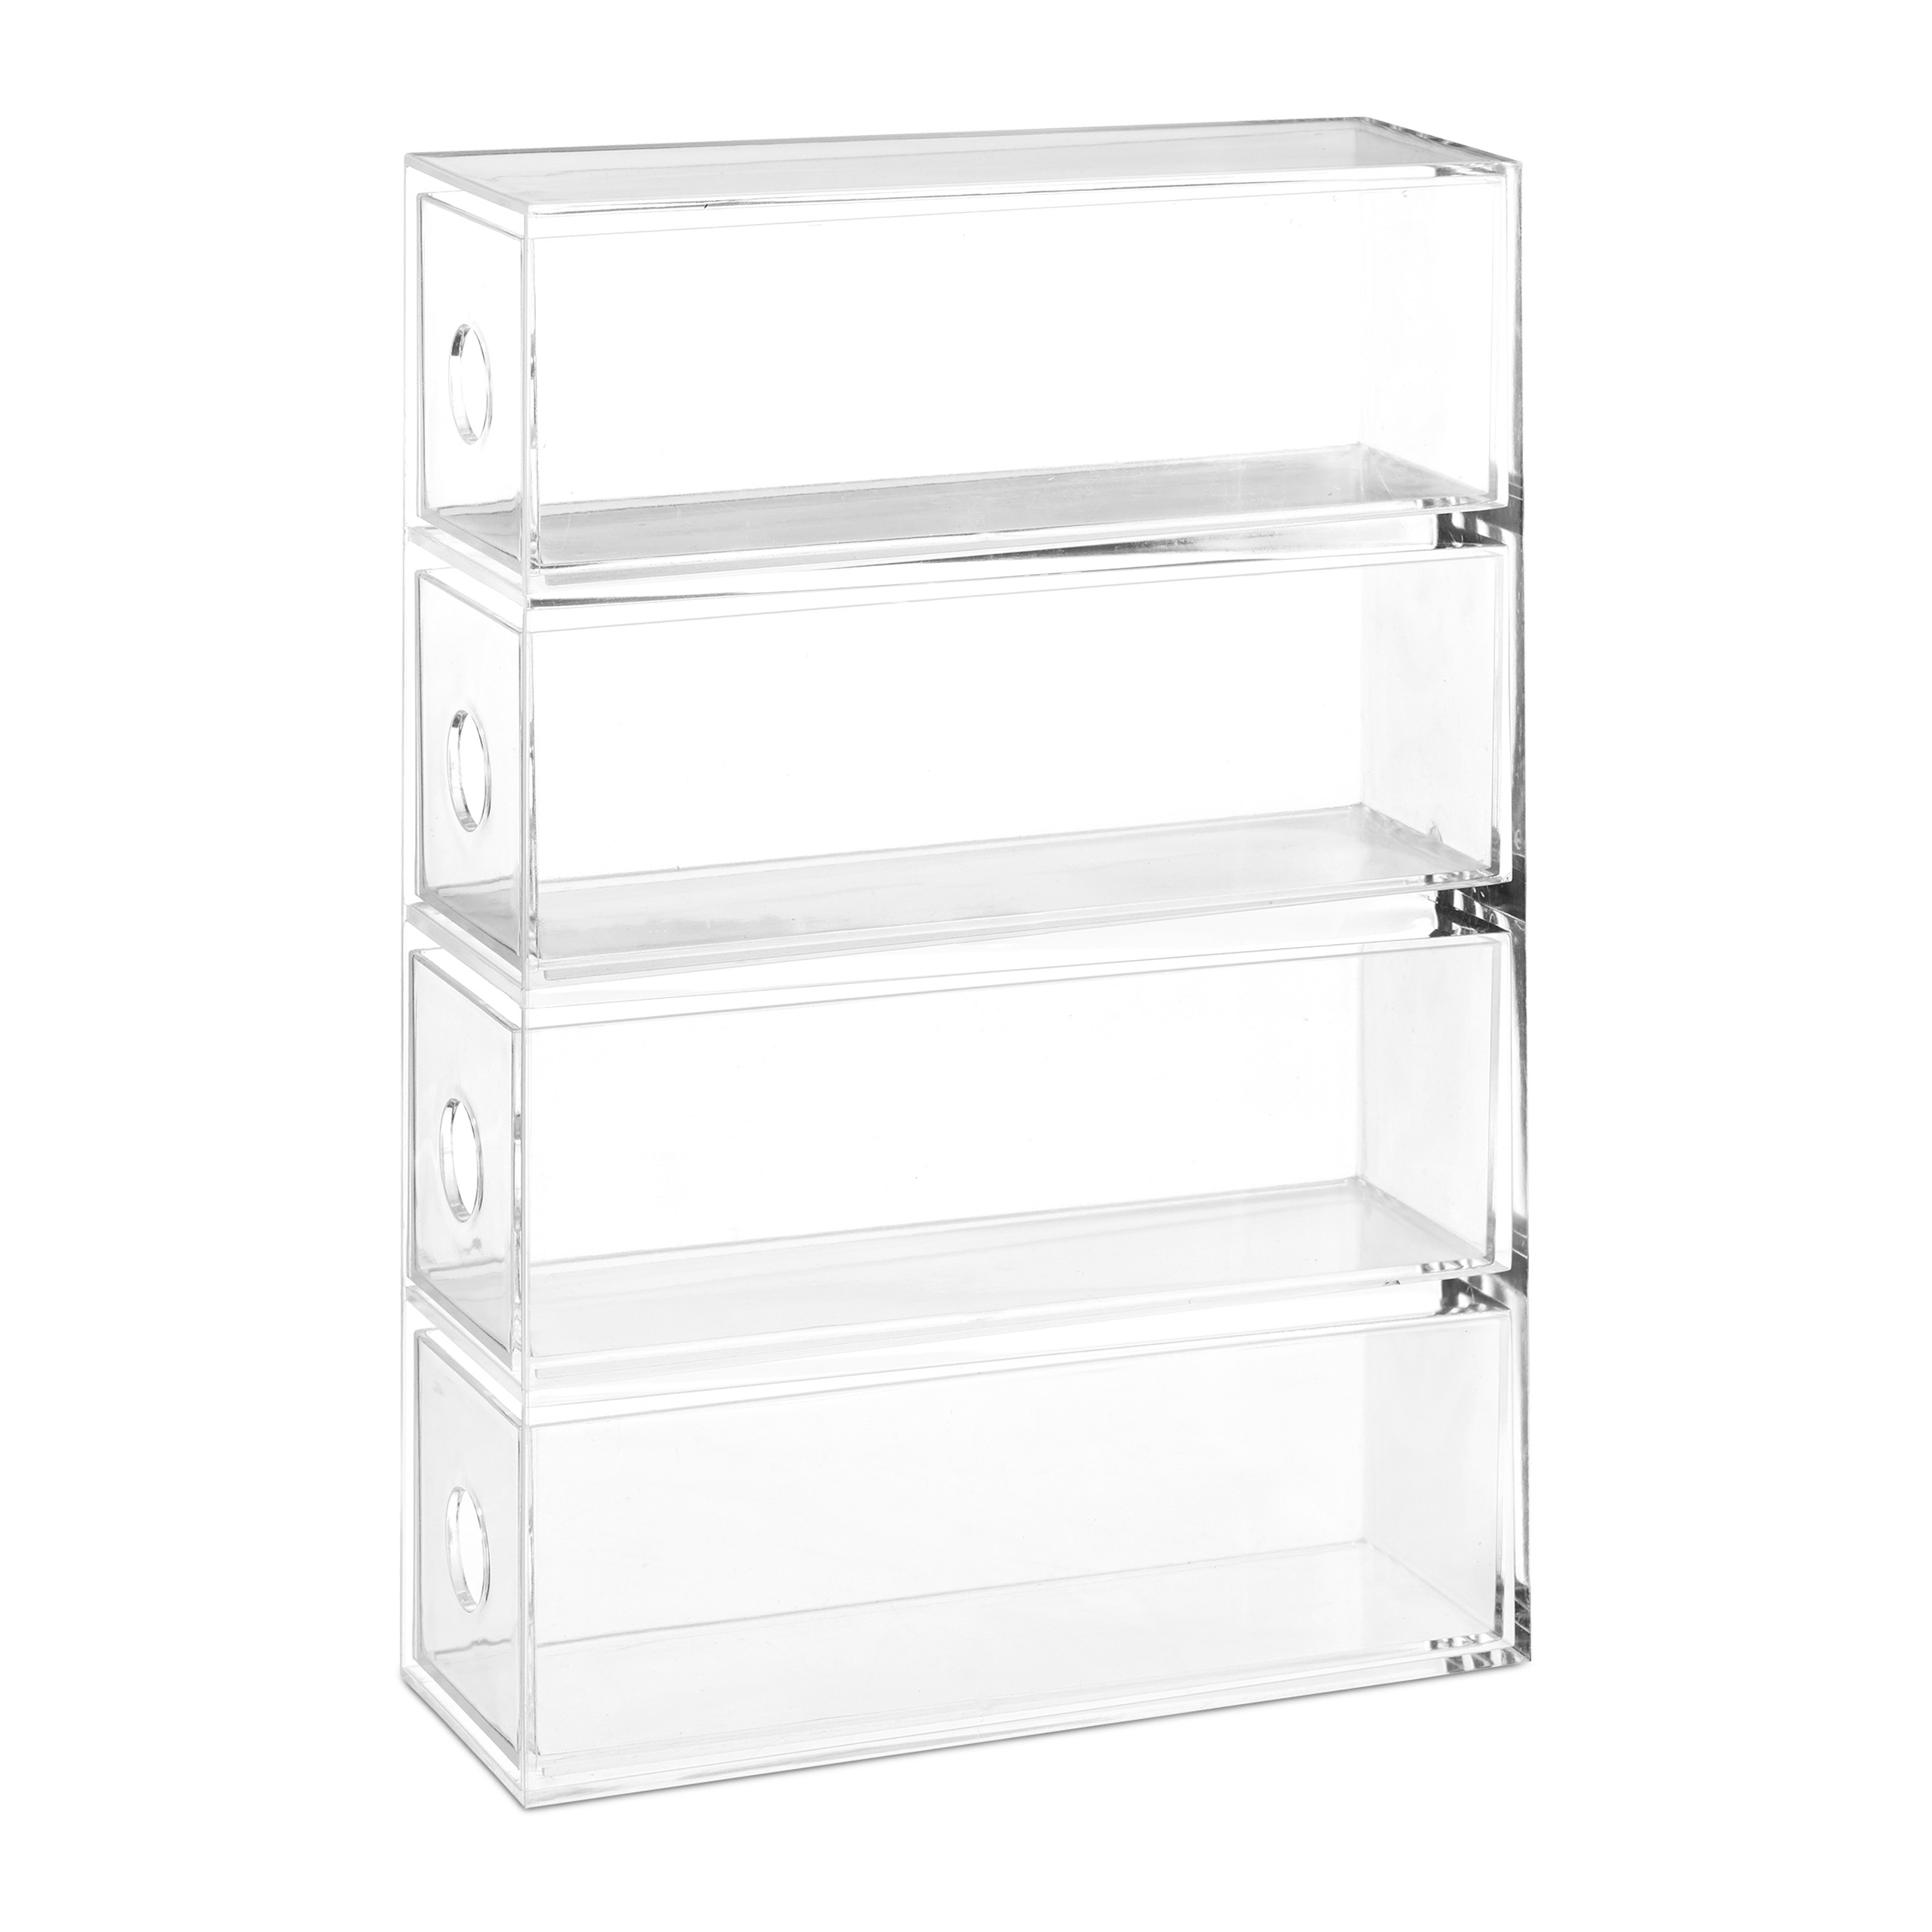 Make-Up-Organizer-Acryl-Schubladenbox-4-Schubladen-Kosmetikorganizer-transparent miniatuur 5